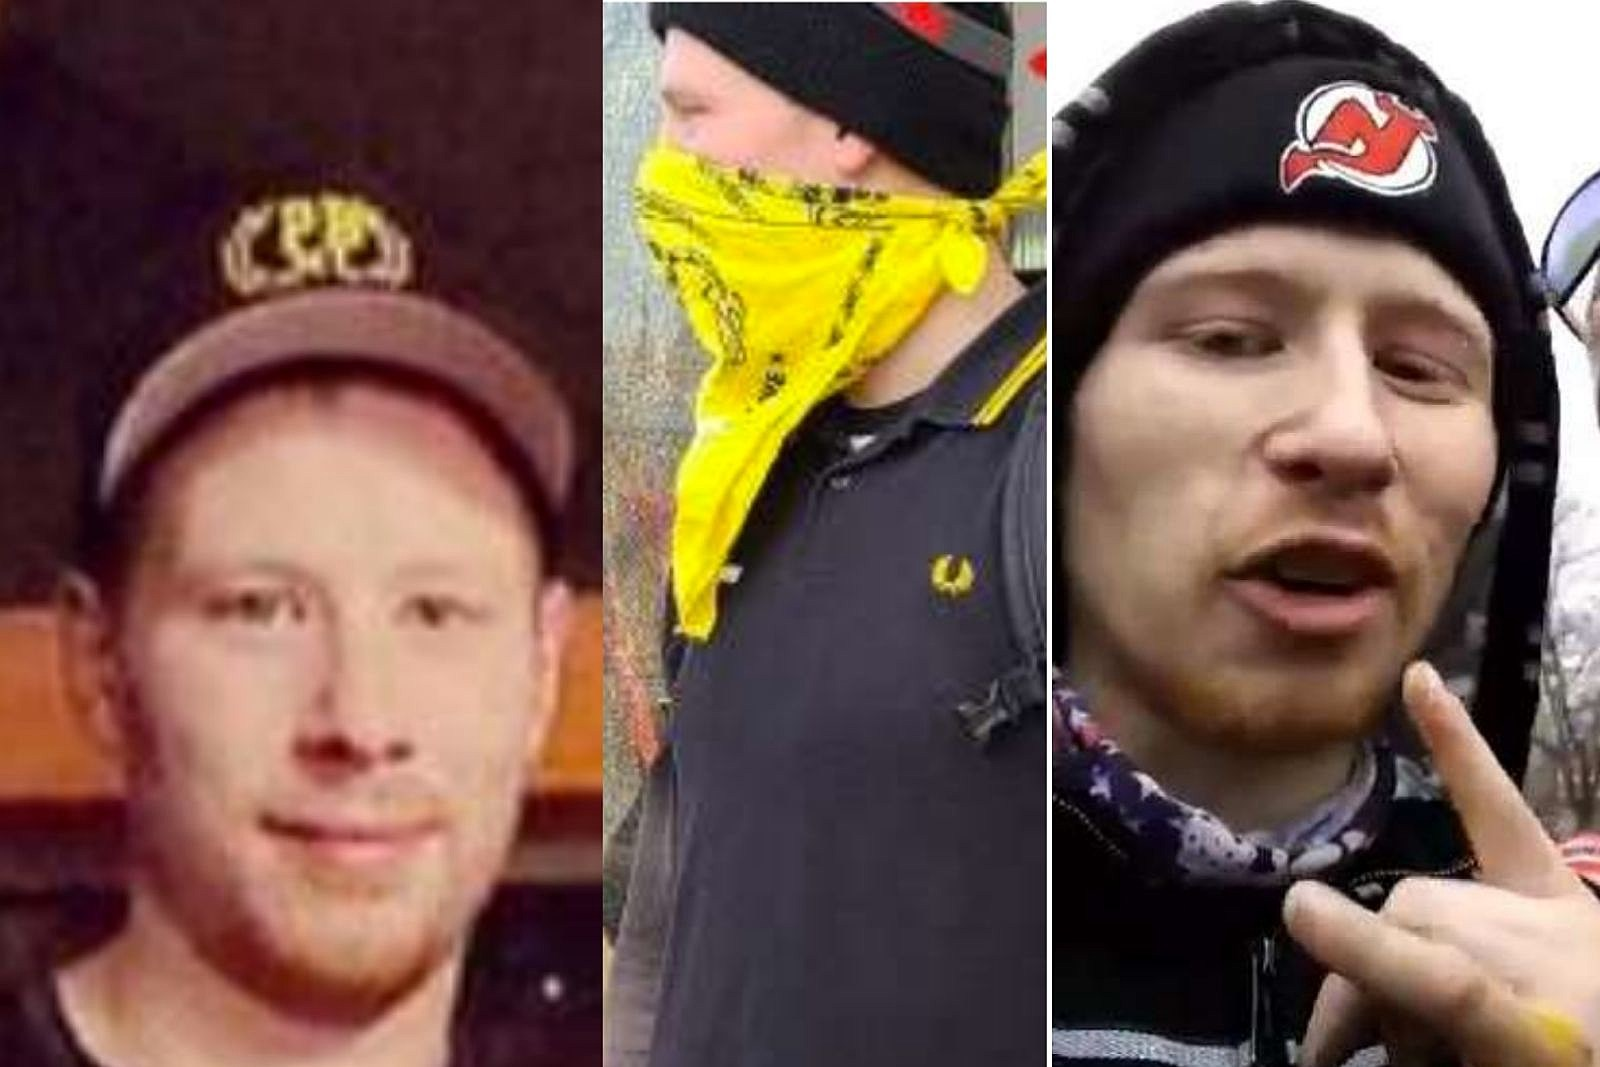 Rockaway, NJ 'Proud Boy' told mom he led Capitol mob, feds say